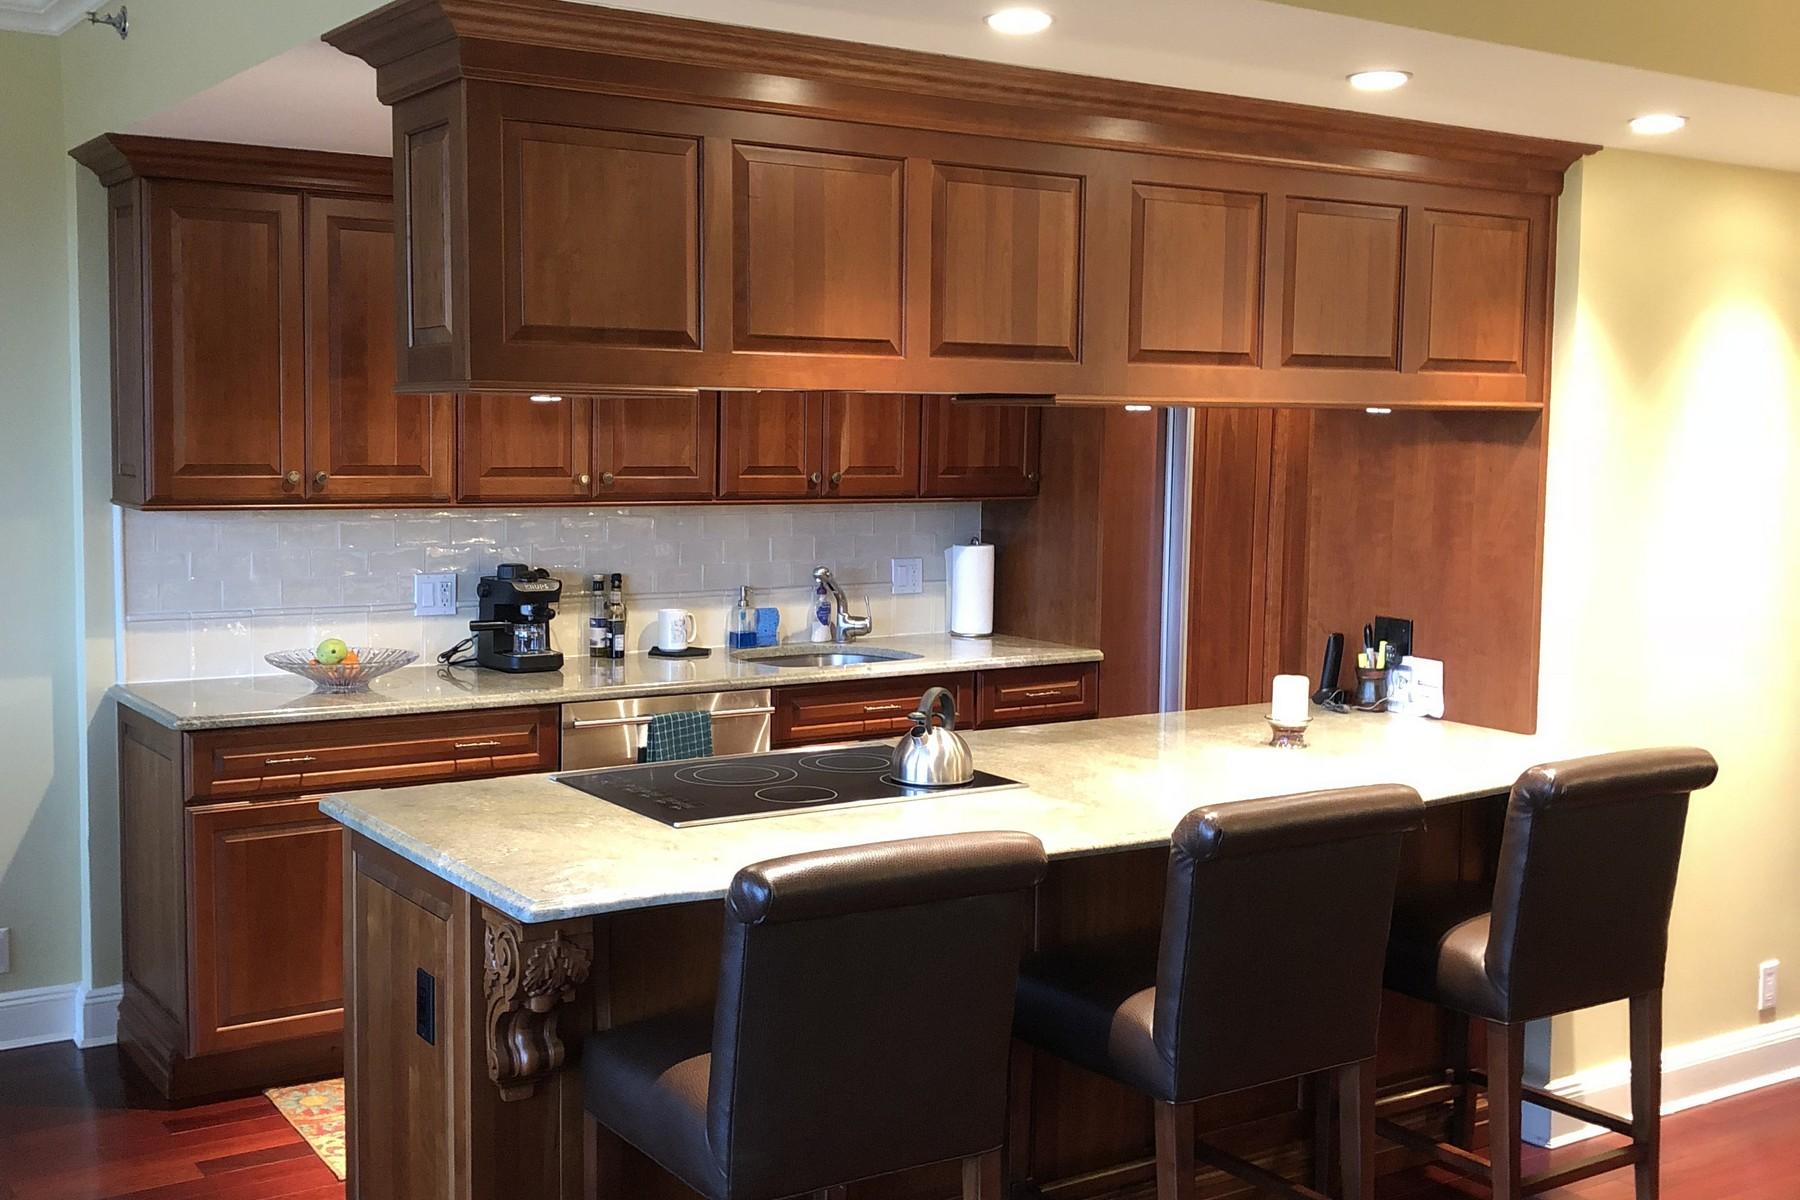 Condominiums for Sale at Garden City 100 Hilton Ave , 801 Garden City, New York 11530 United States